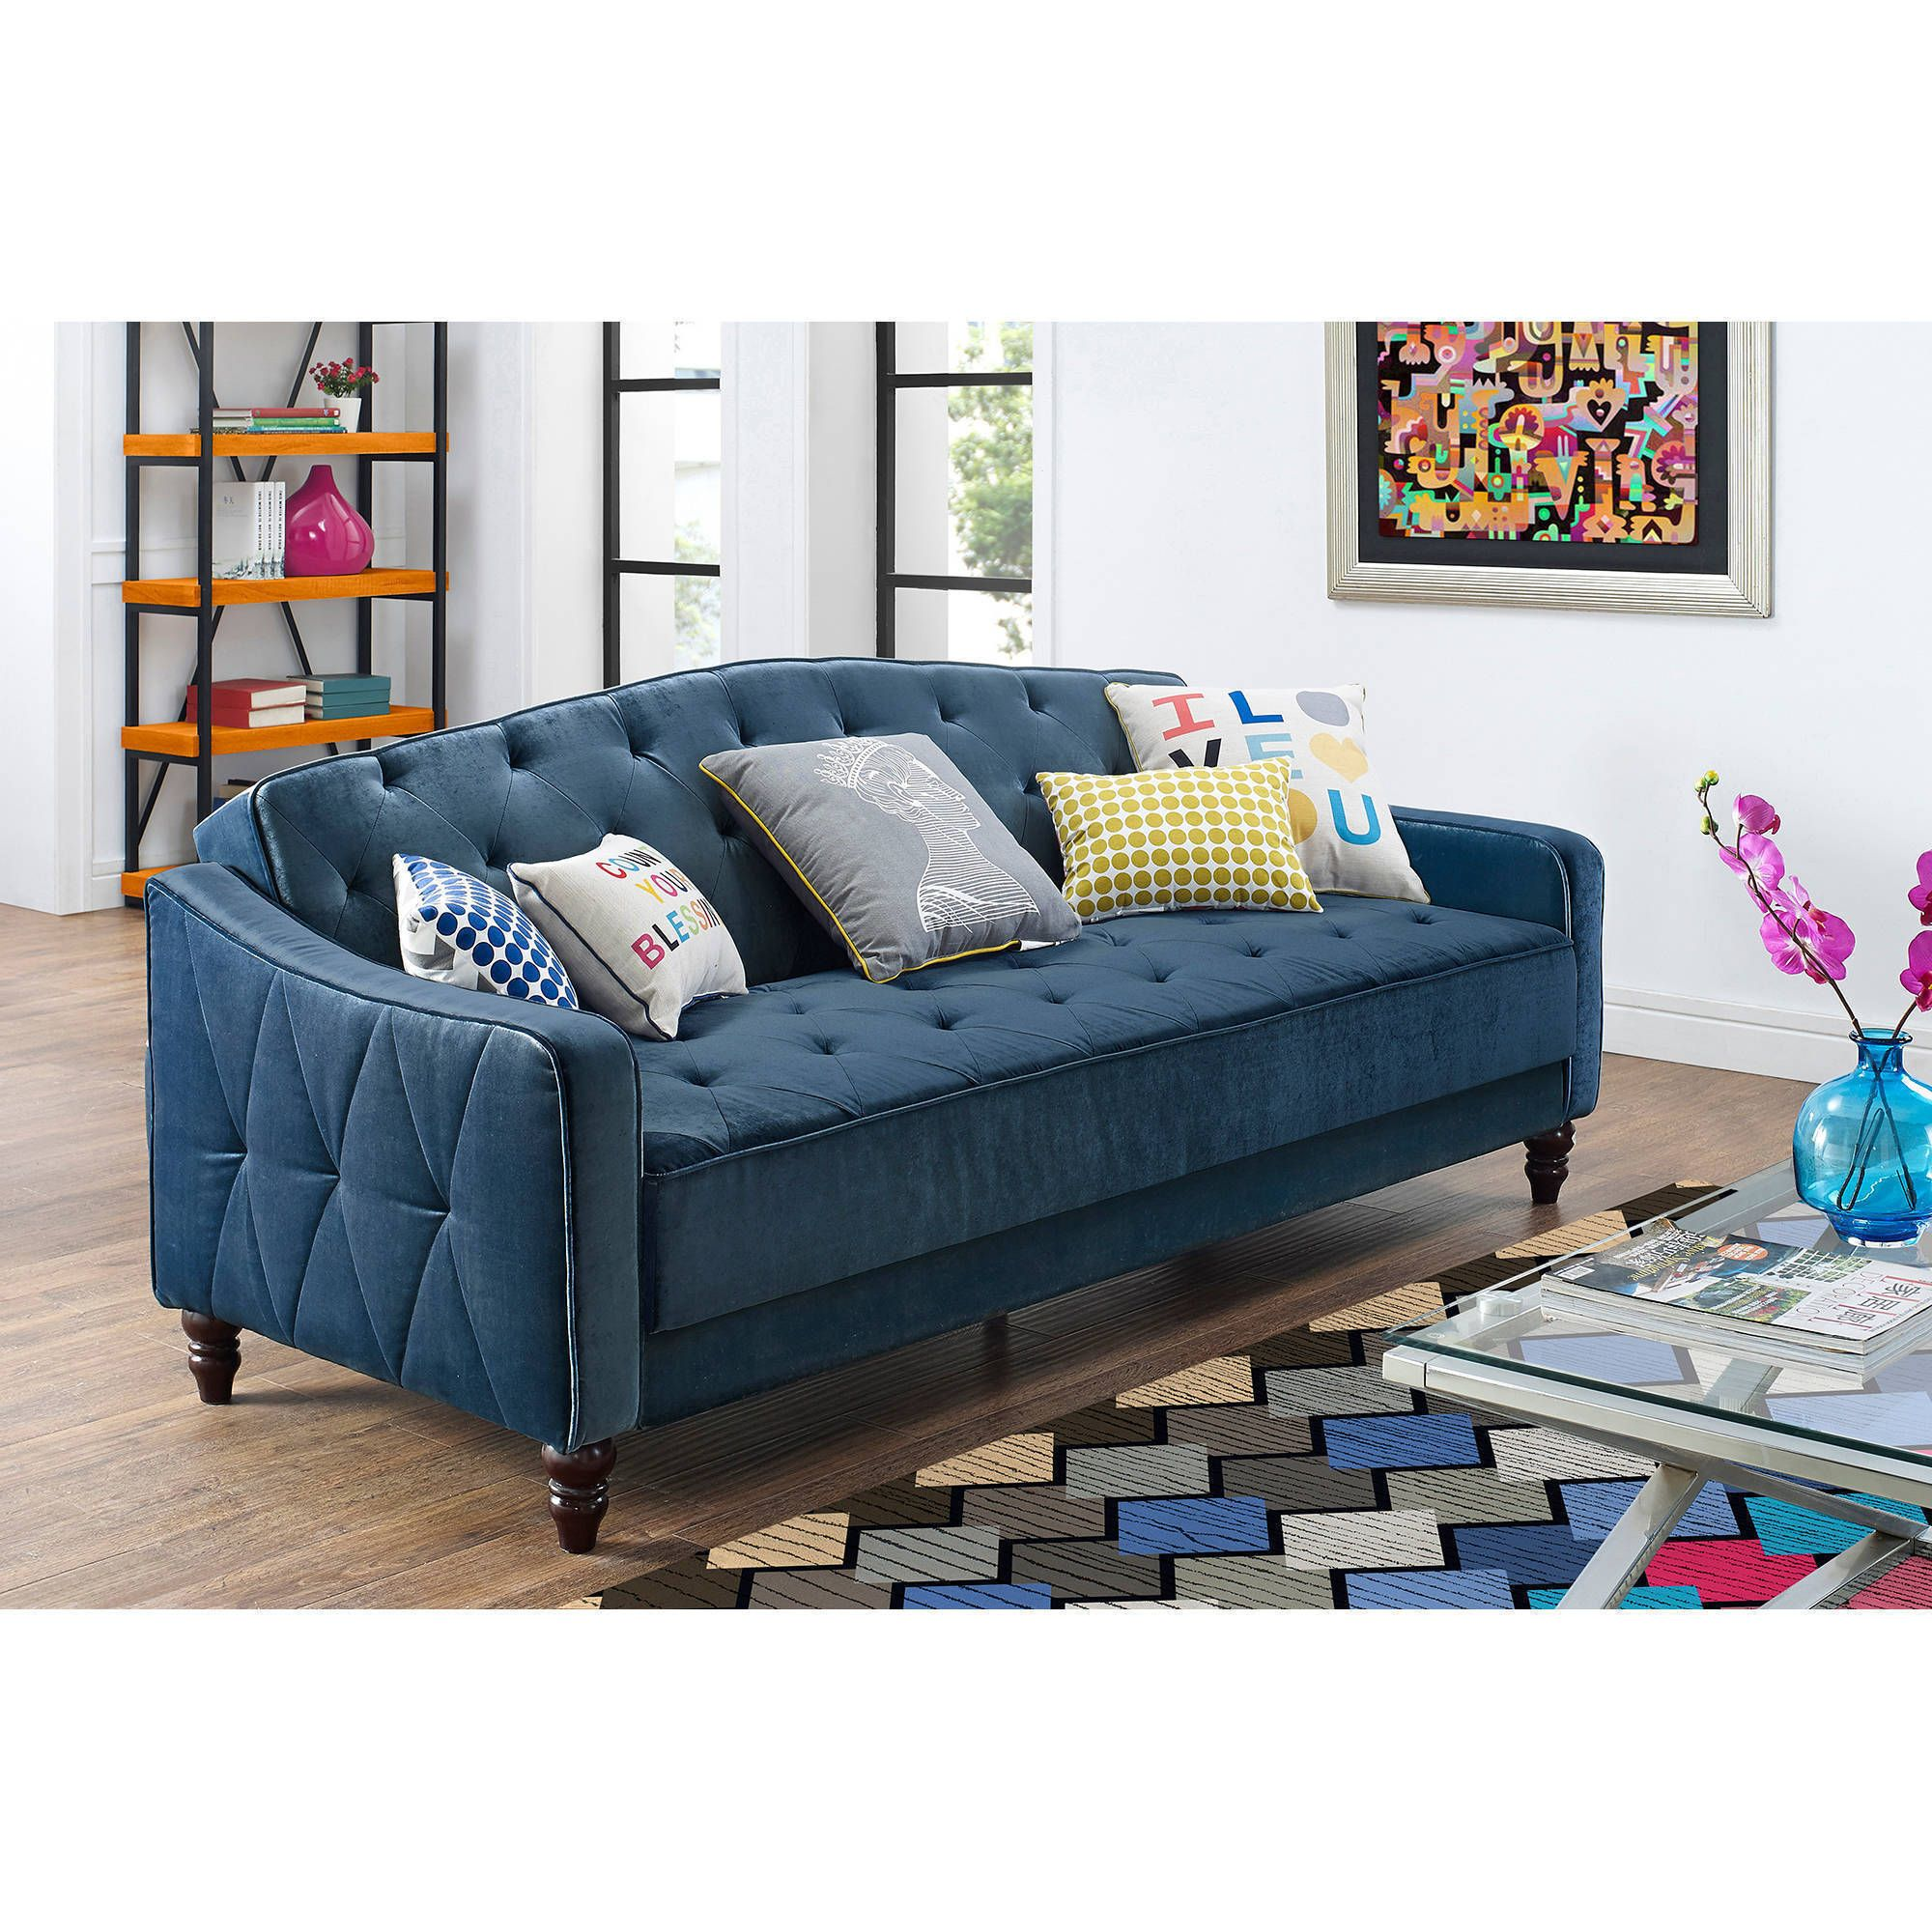 9 By Novogratz Vintage Tufted Sofa Sleeper Ii Multiple Colors Navy Velour Walmart Com Tufted Sofa Cheap Sofas Vintage Sofa